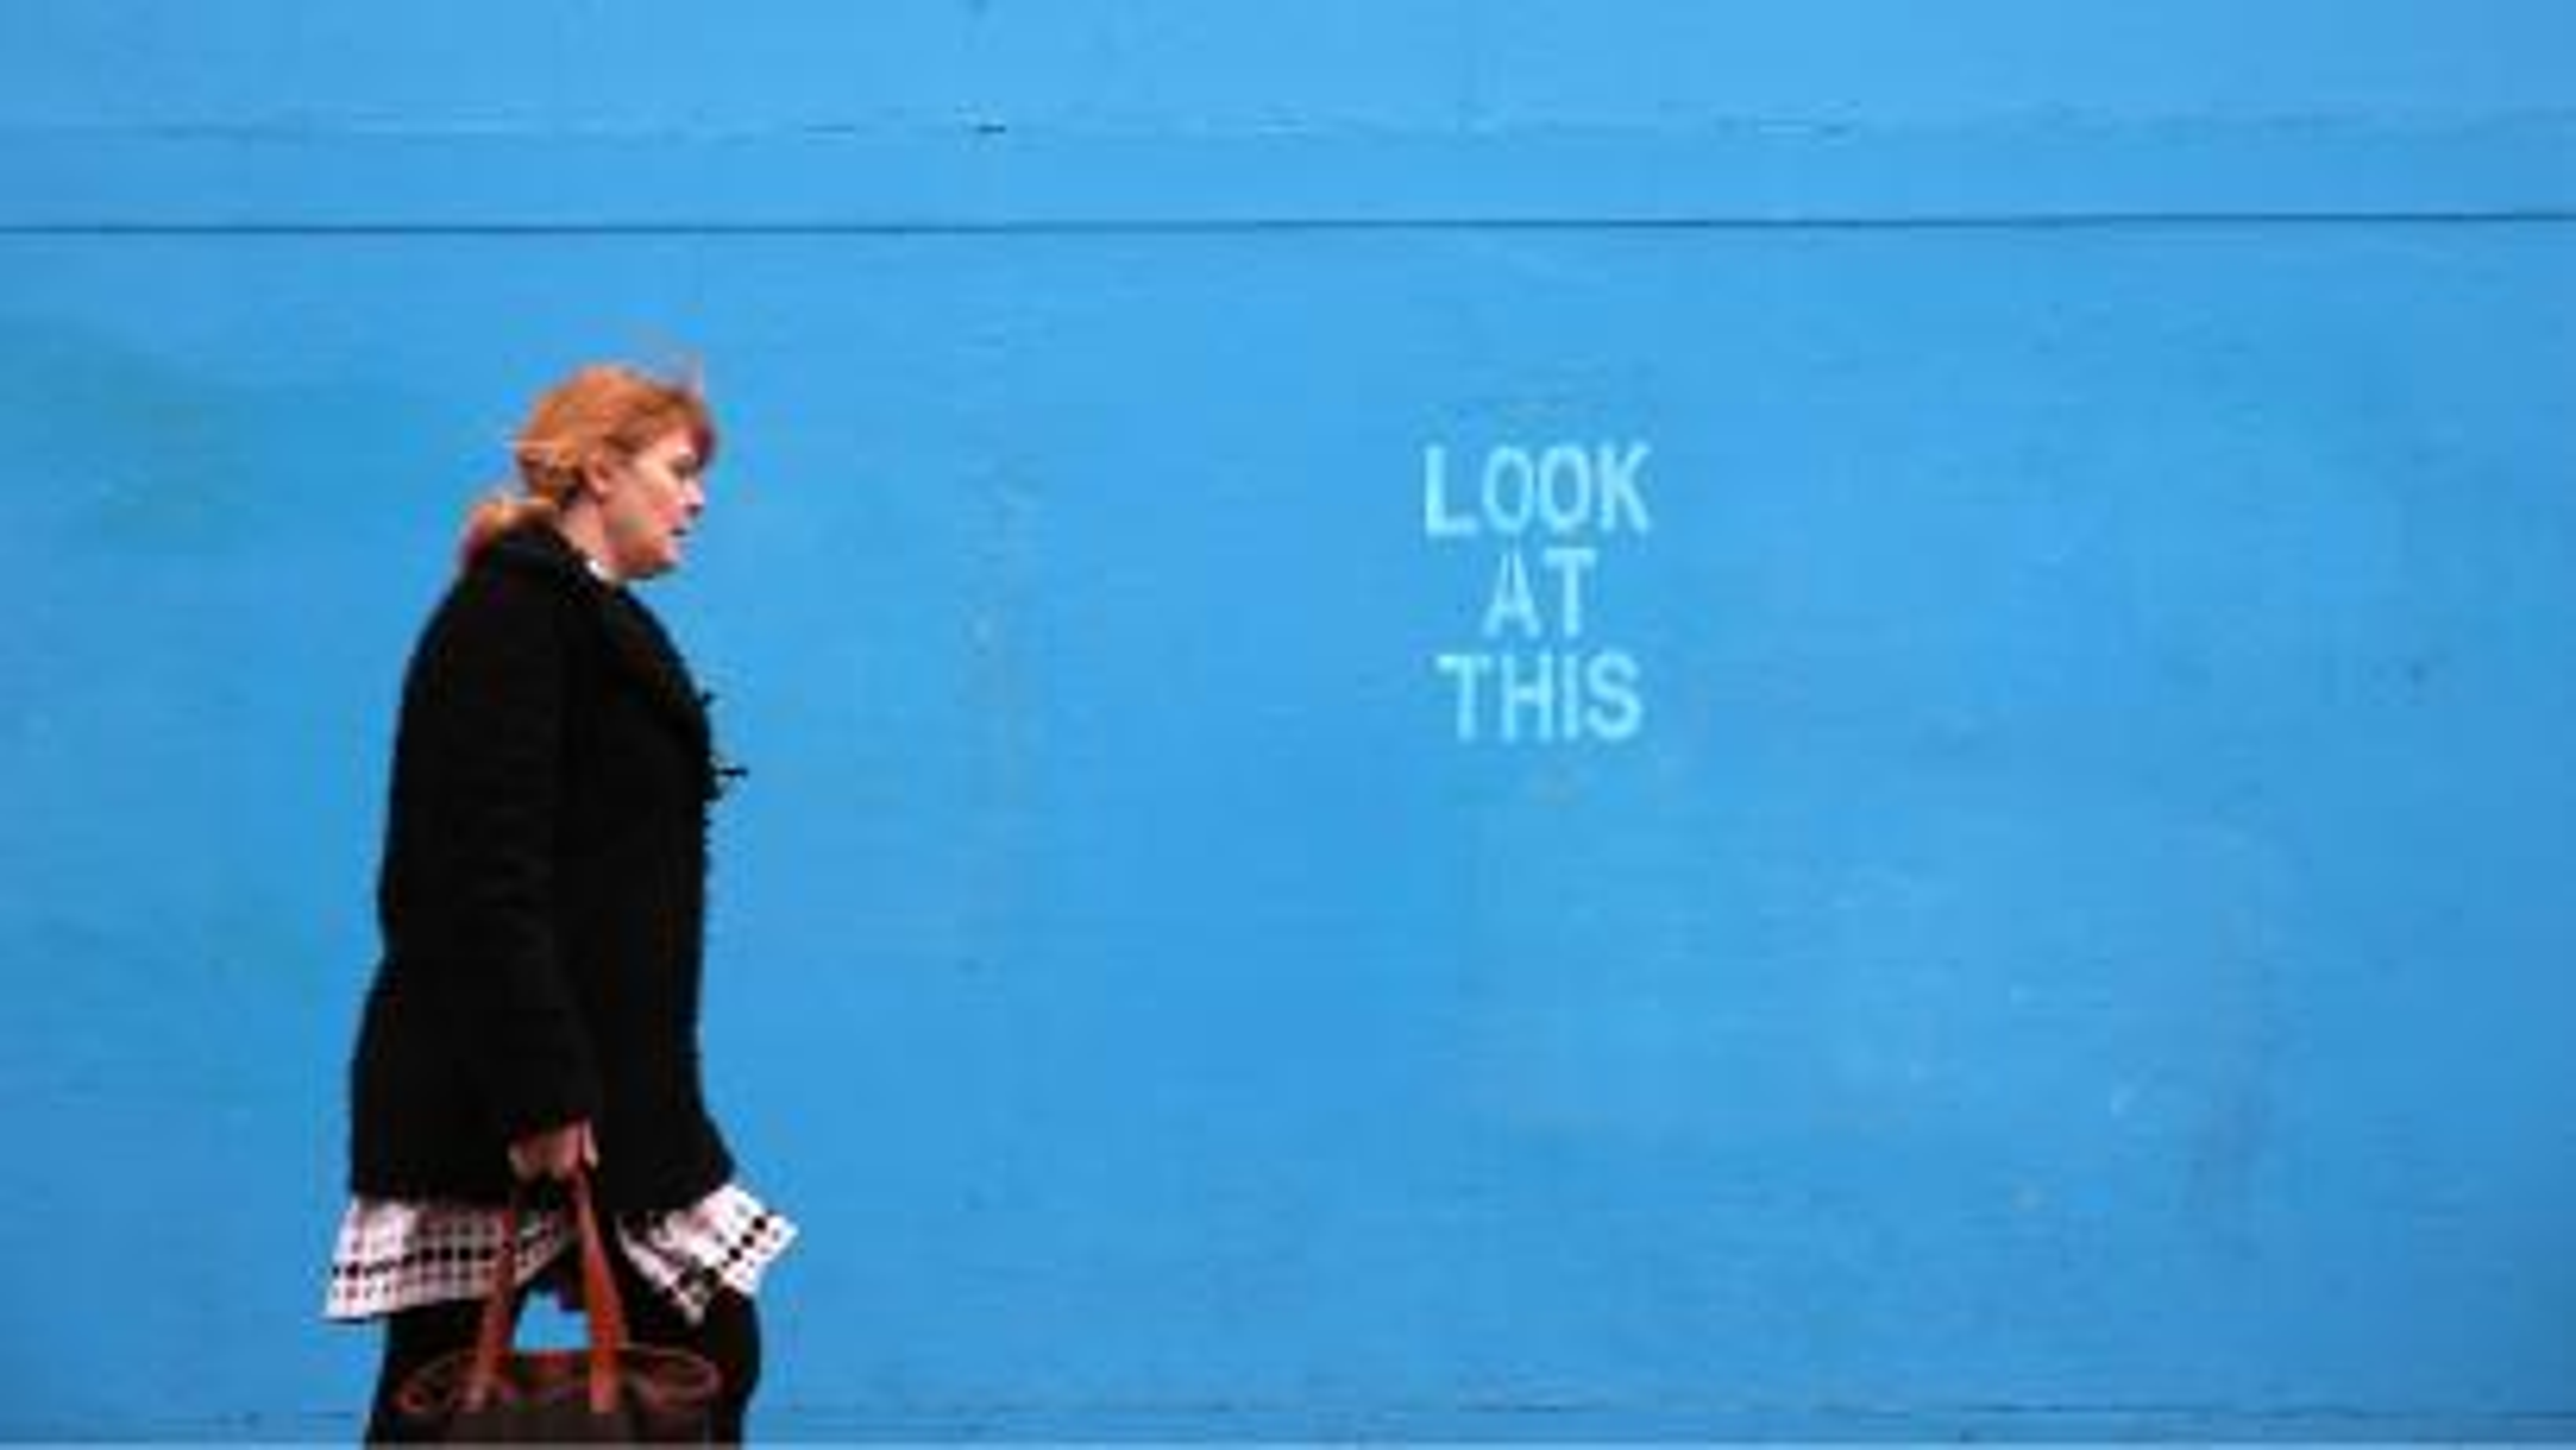 Woman walking past a blue wall